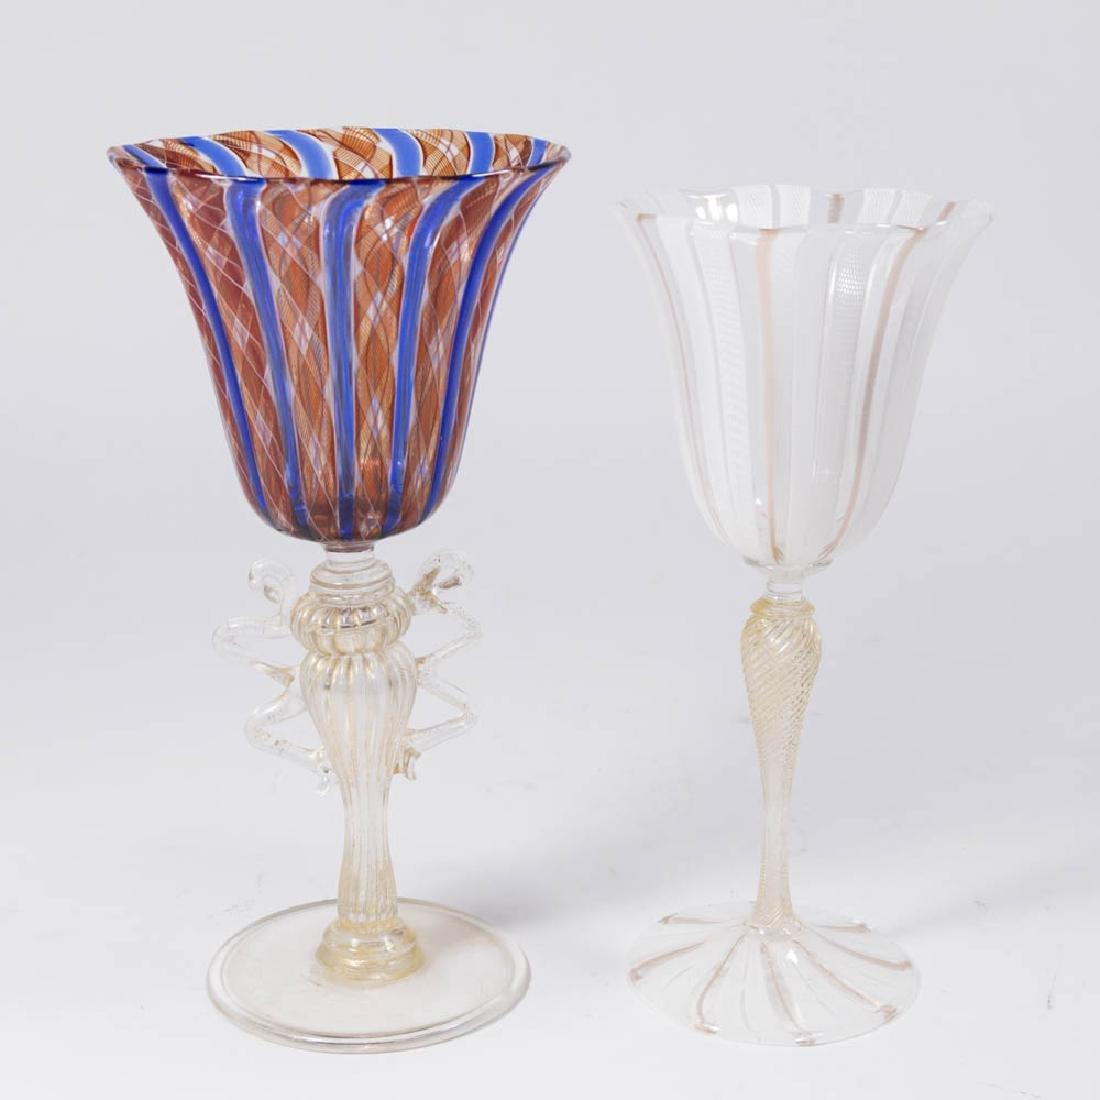 2 Venetian Swirl Colored Glass Goblets